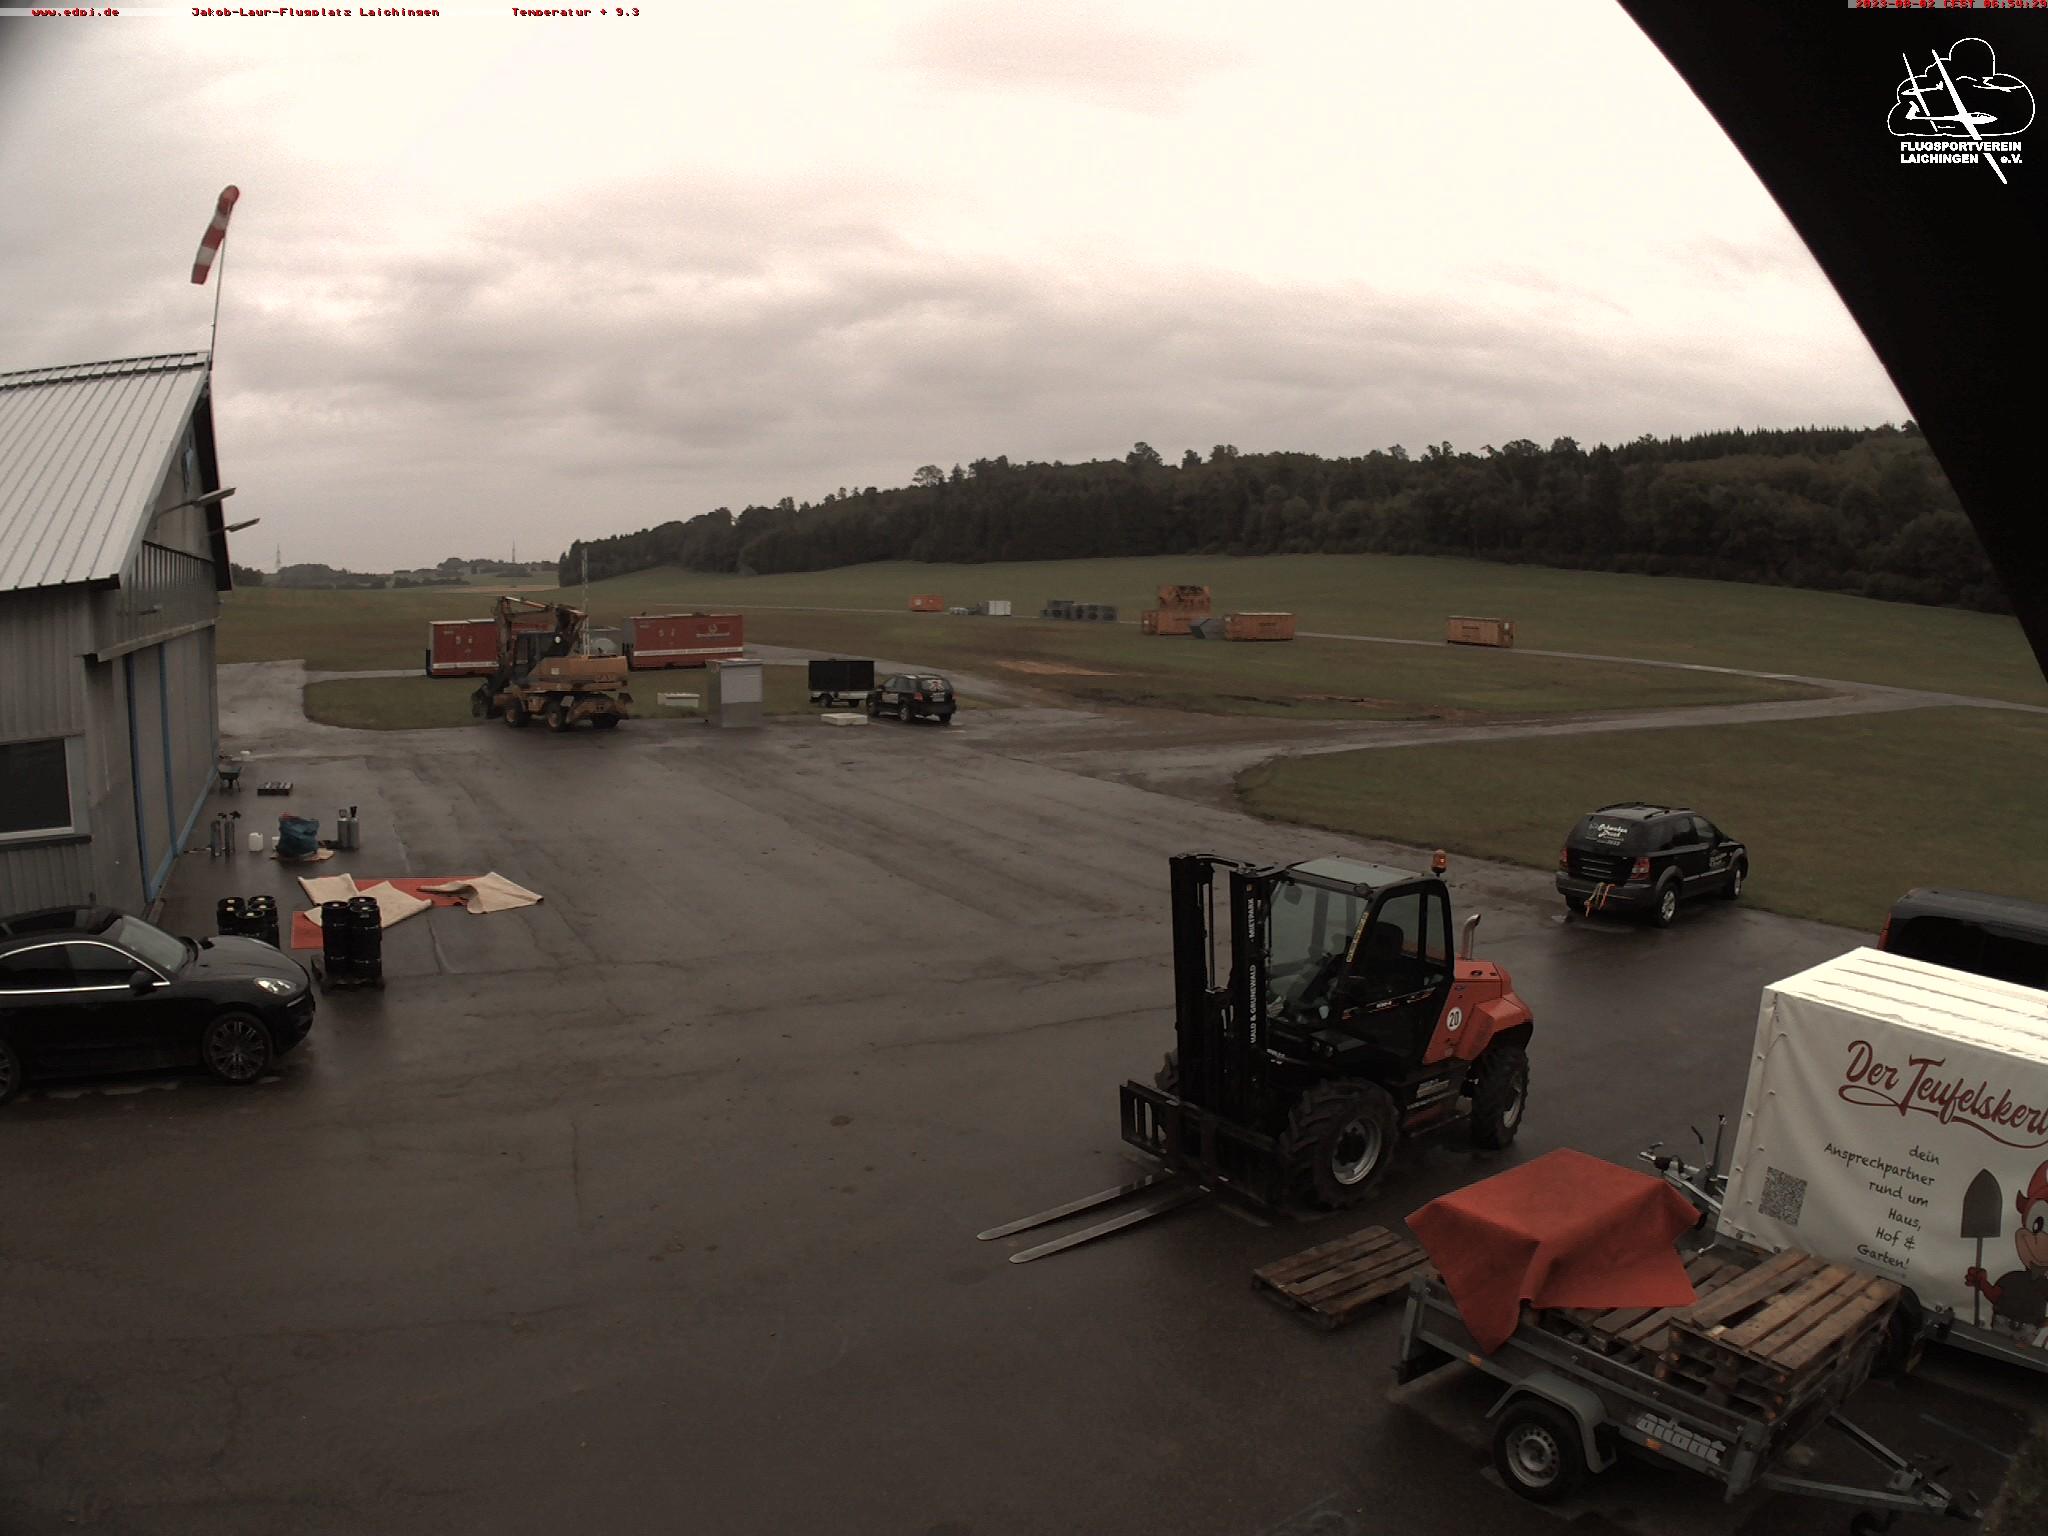 Laichingen Wed. 06:55